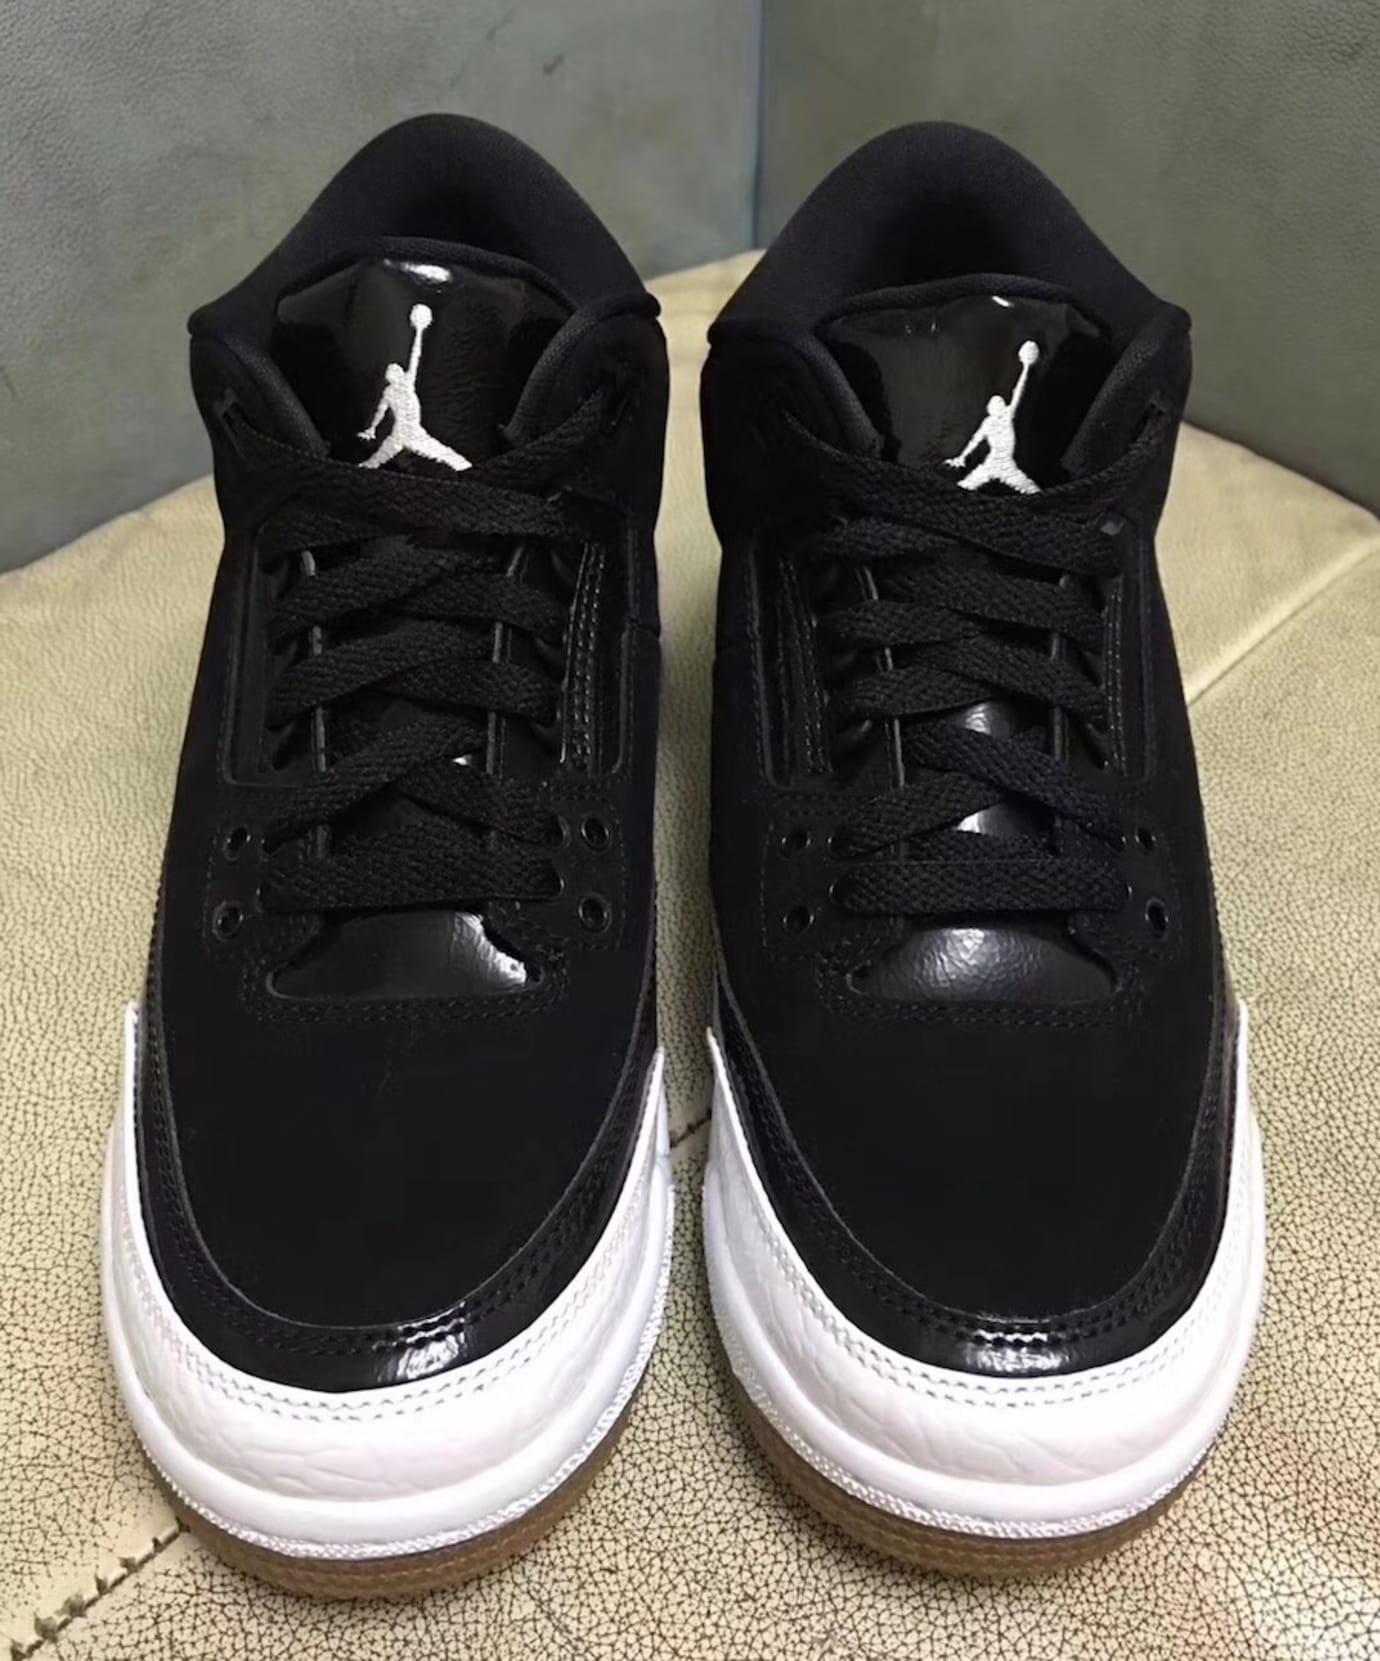 Air Jordan 3 III GS Black White Release Date 441140-022 Front e8afee5e67